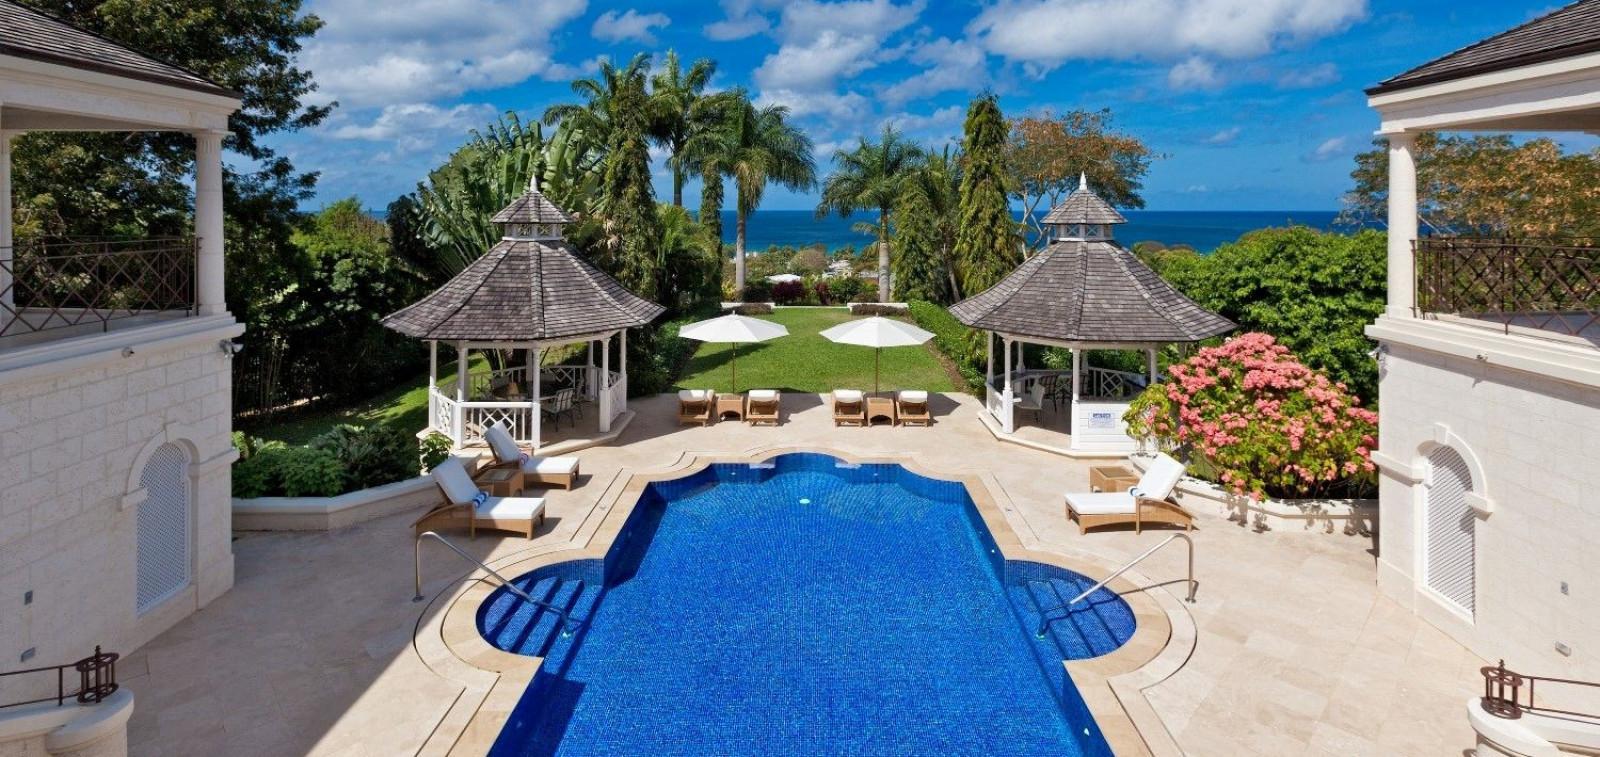 Beautiful Swimming Pool 5 Bedroom Villa Sugar Hill with Putting Green & Sea Views